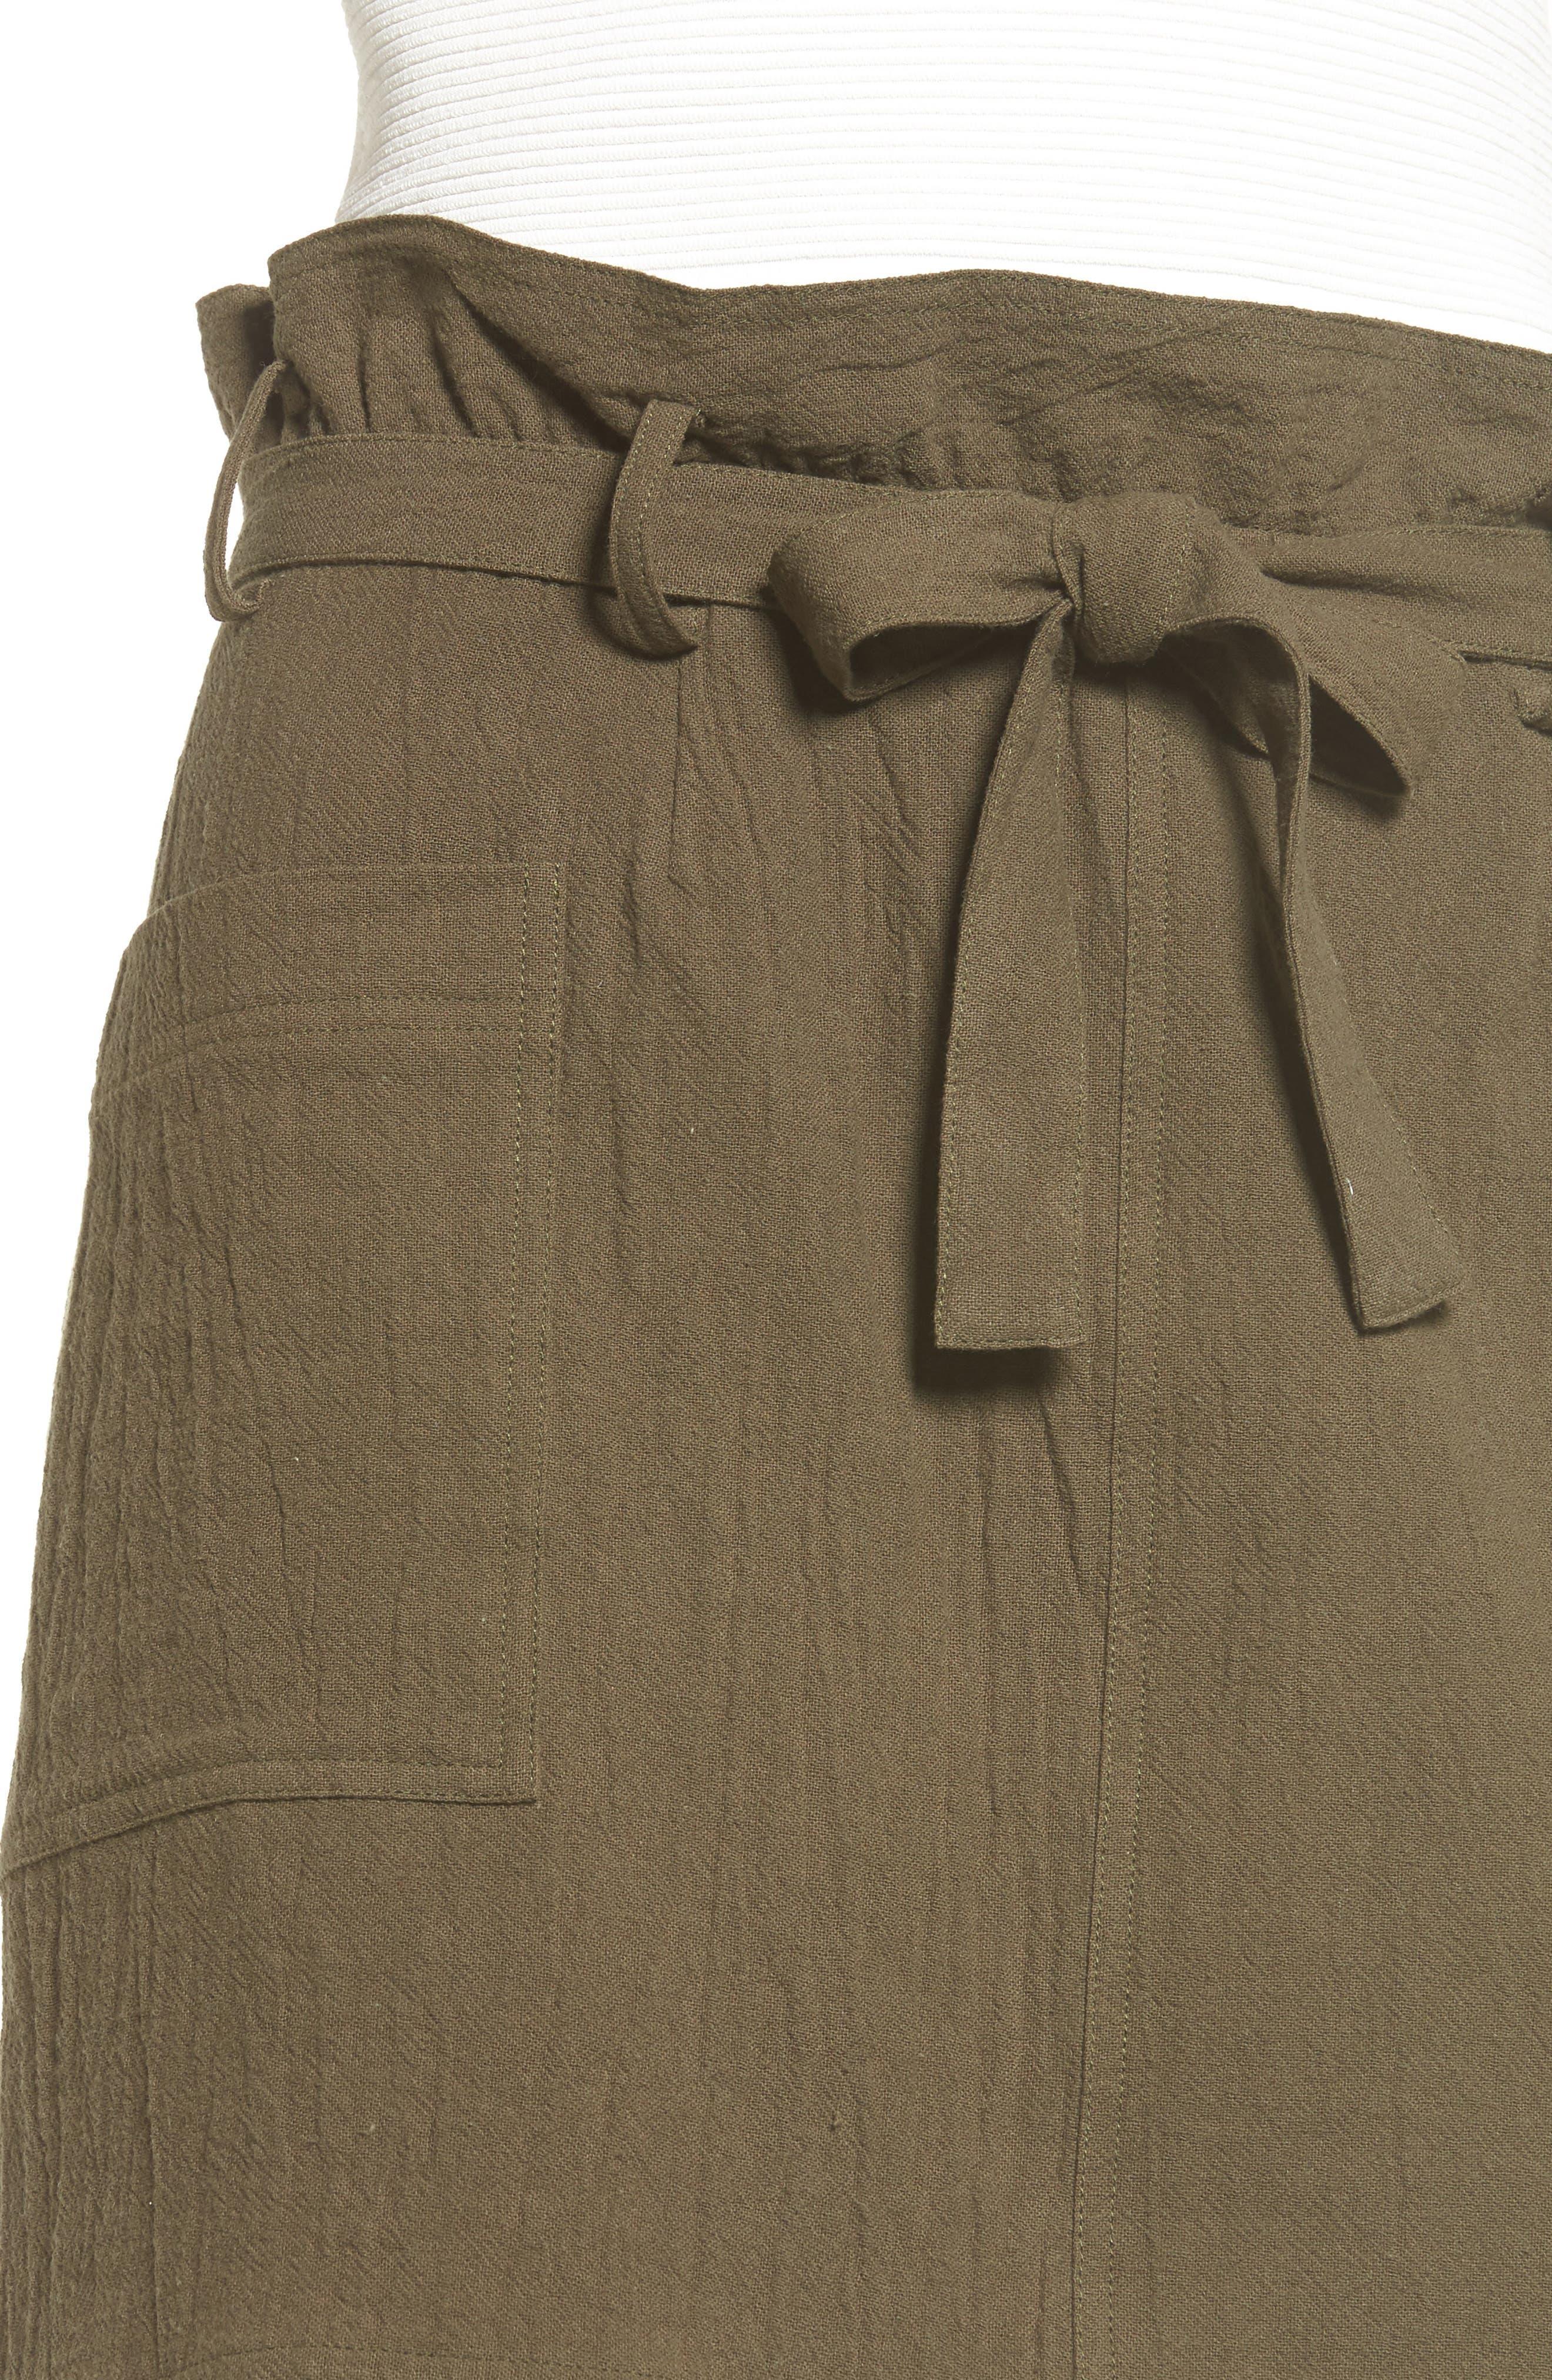 Paperbag Miniskirt,                             Alternate thumbnail 4, color,                             Olive Sarma